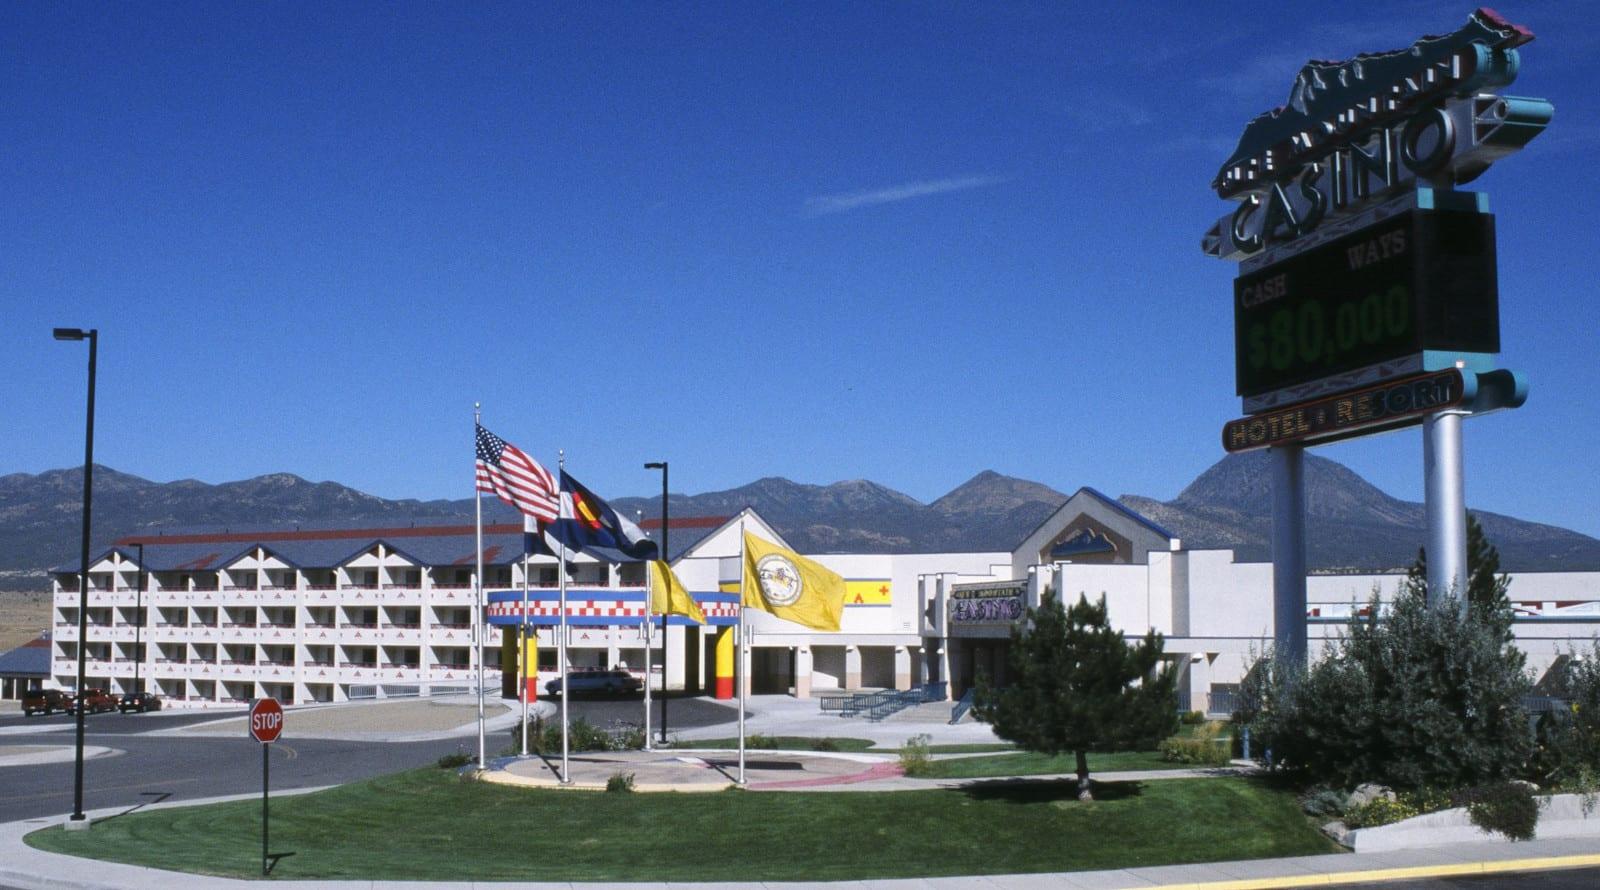 Ute Mountain Casino Towaoc